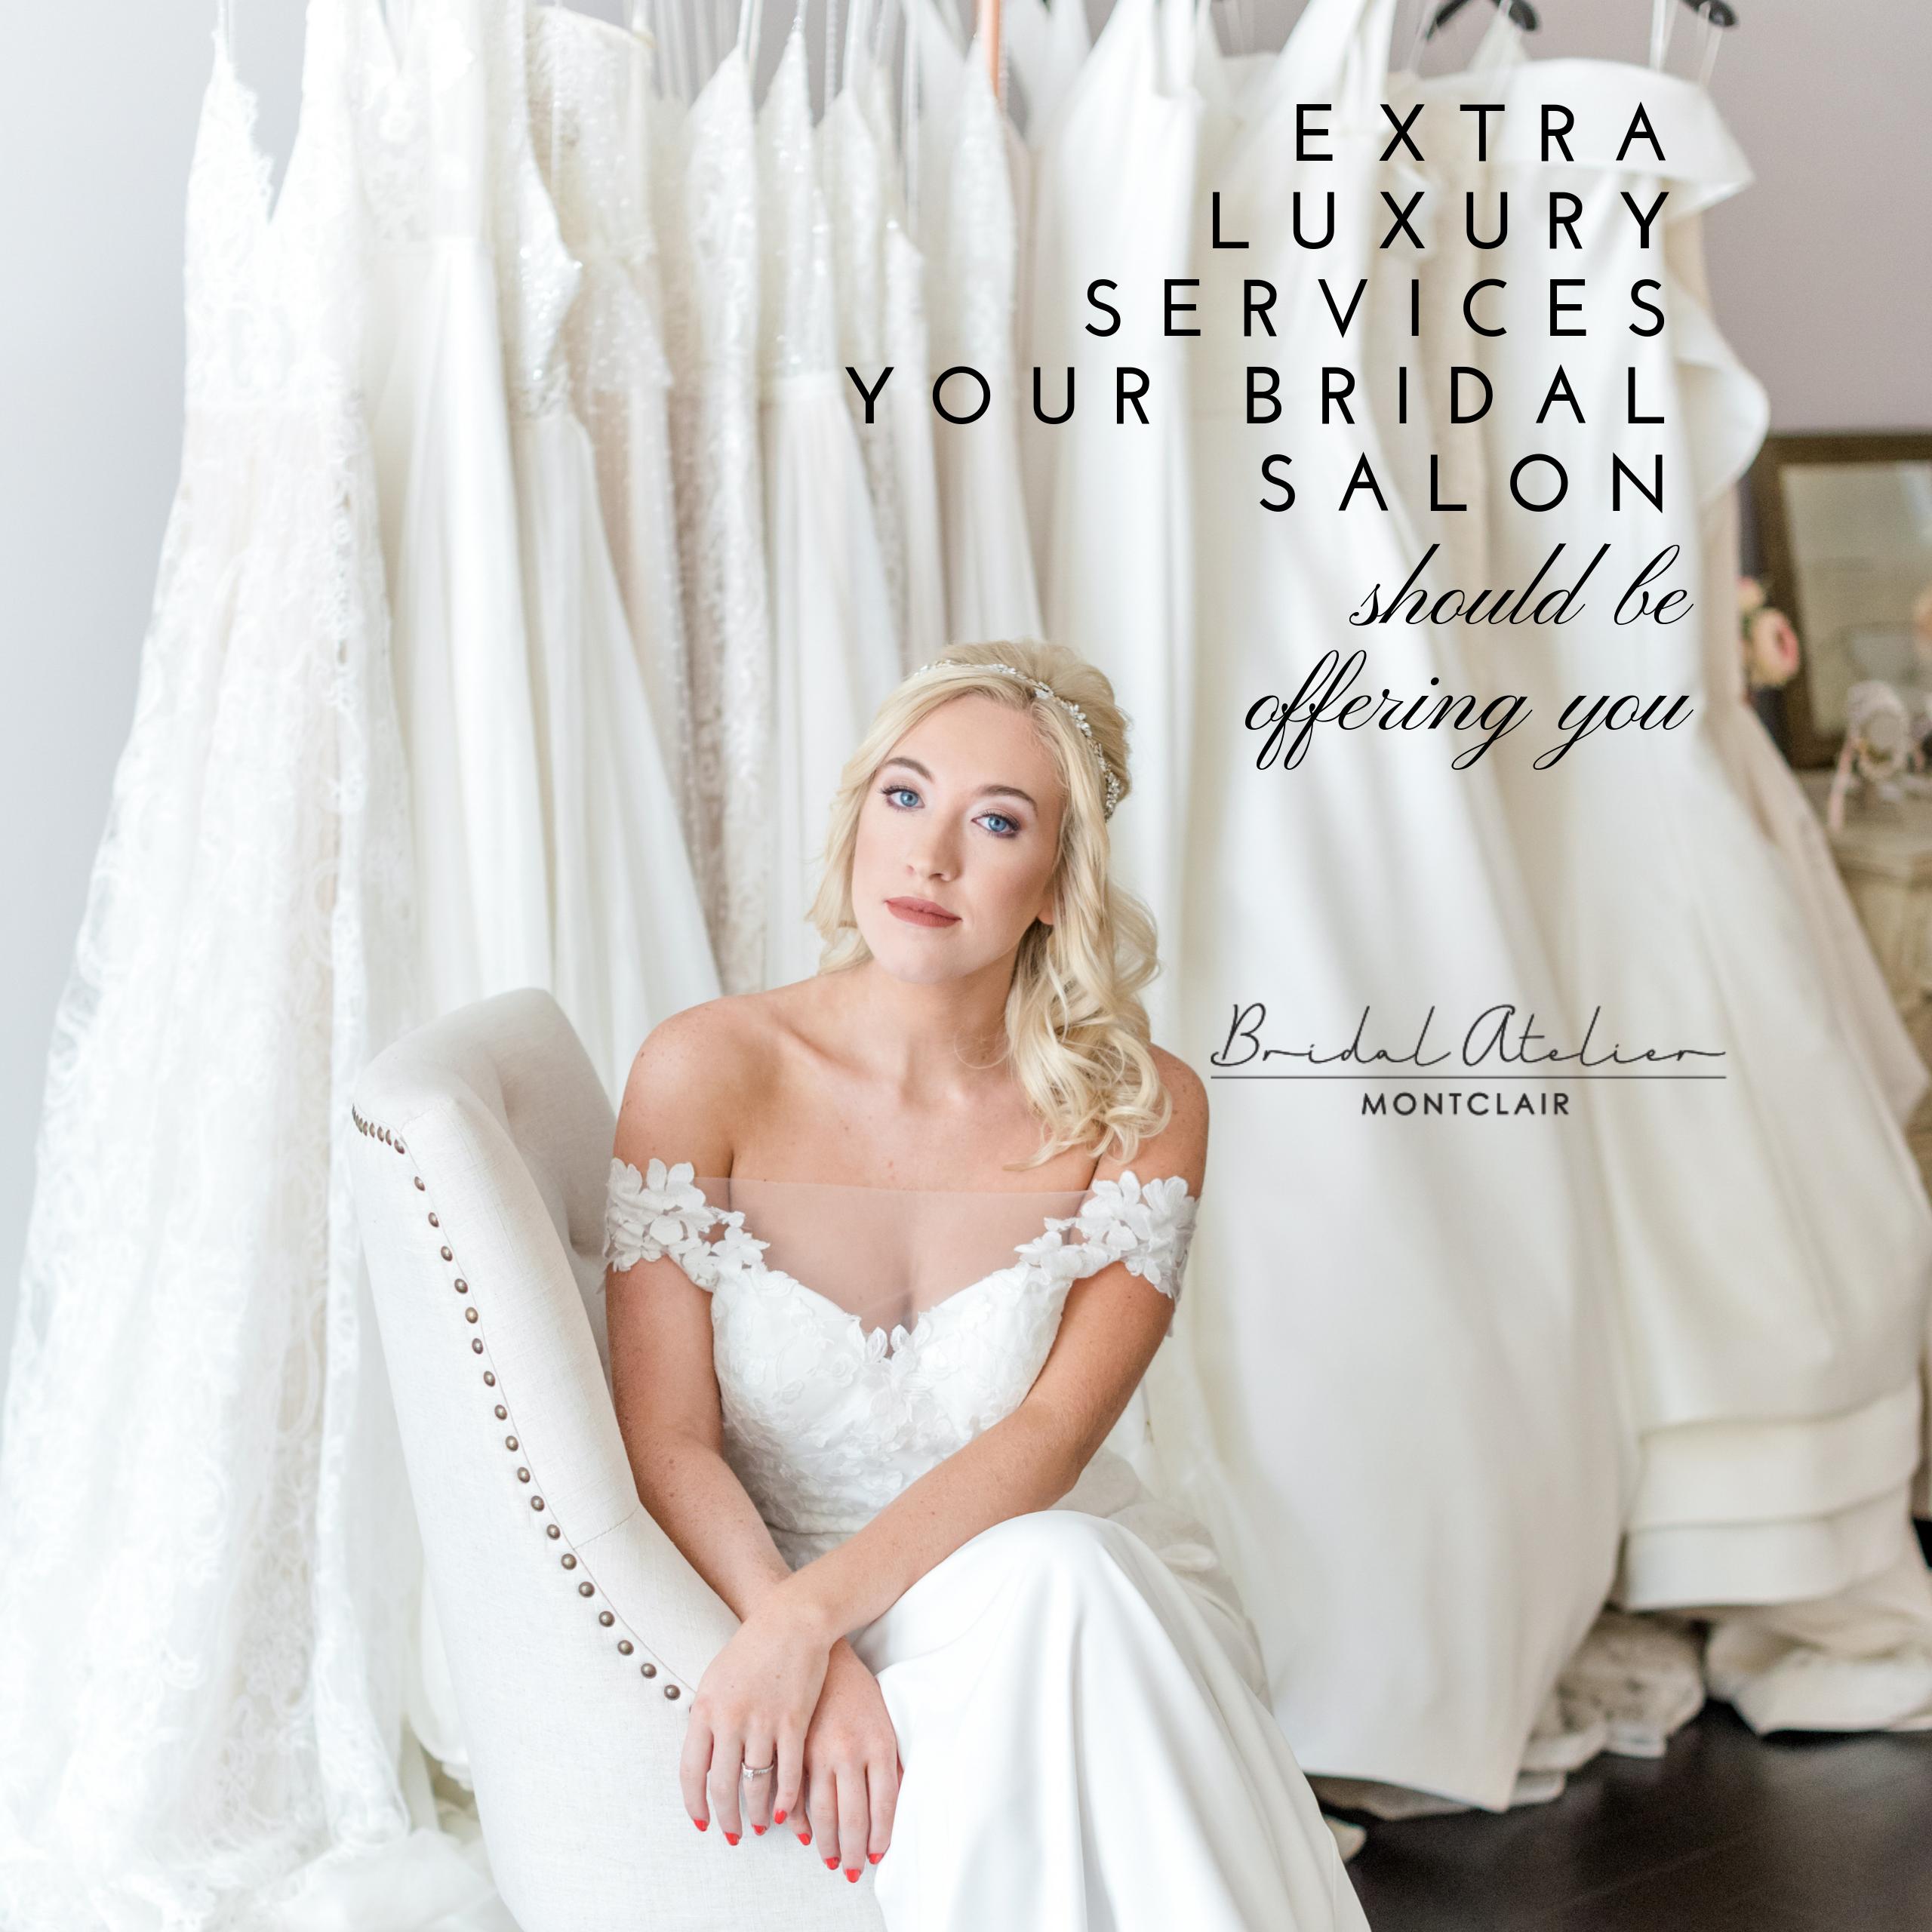 Wedding Salon Services Avedasalon Extra Luxury Services Your Bridal Salon Wedding Salon Services In 2020 Wedding Salon Wedding Salon Services